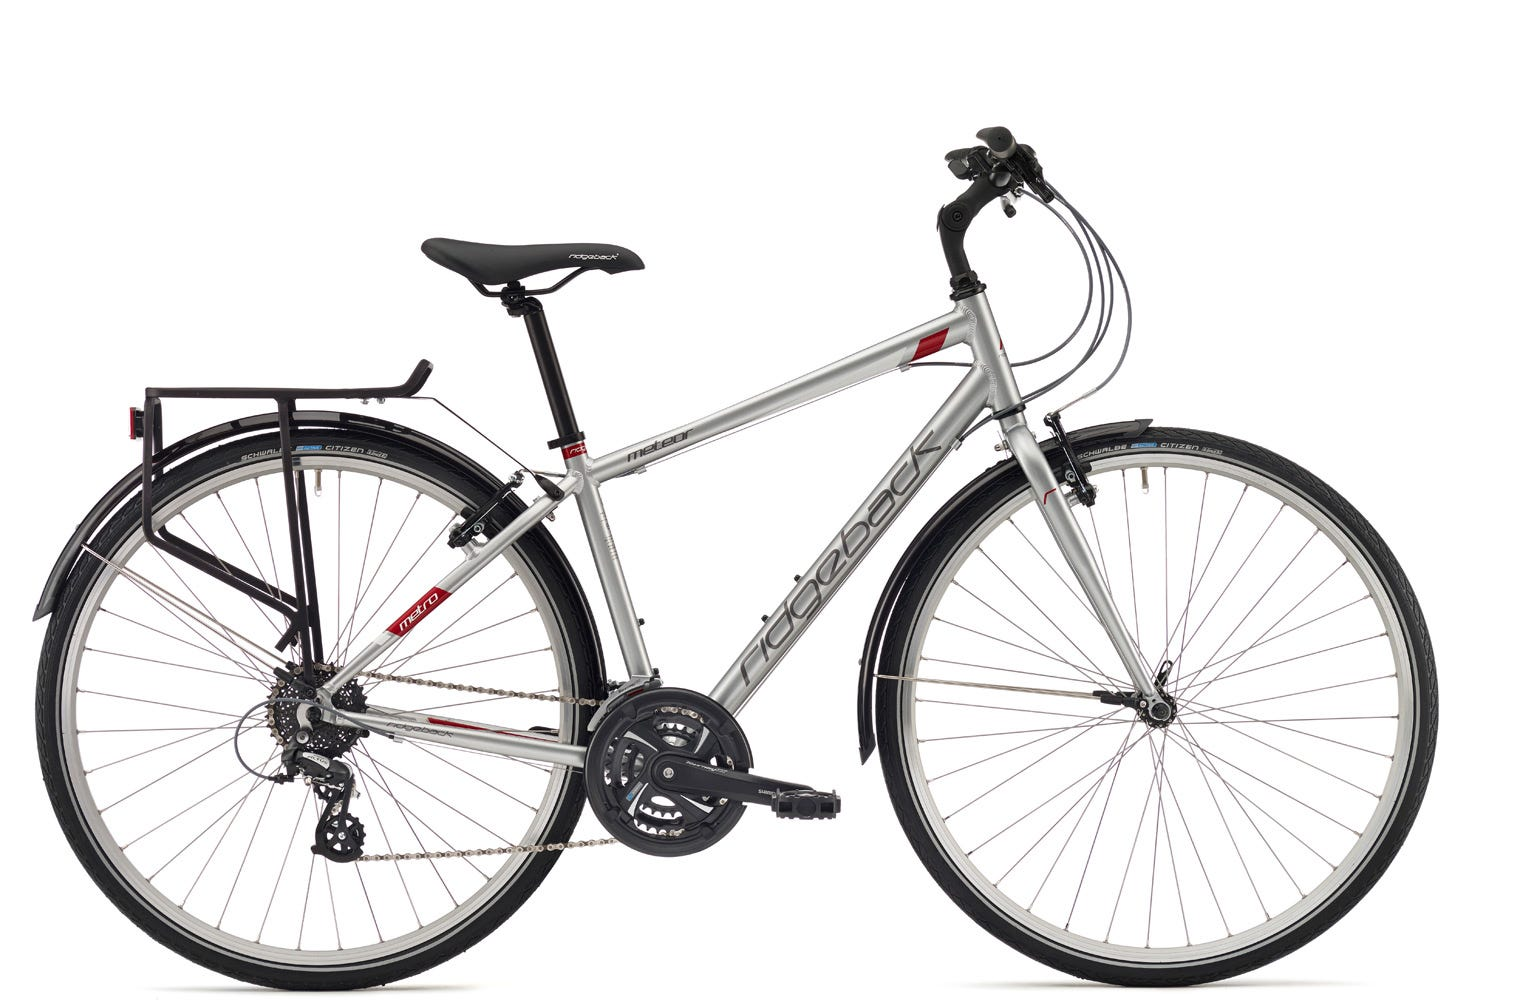 Ridgeback Meteor 23 inch bike Ex Display